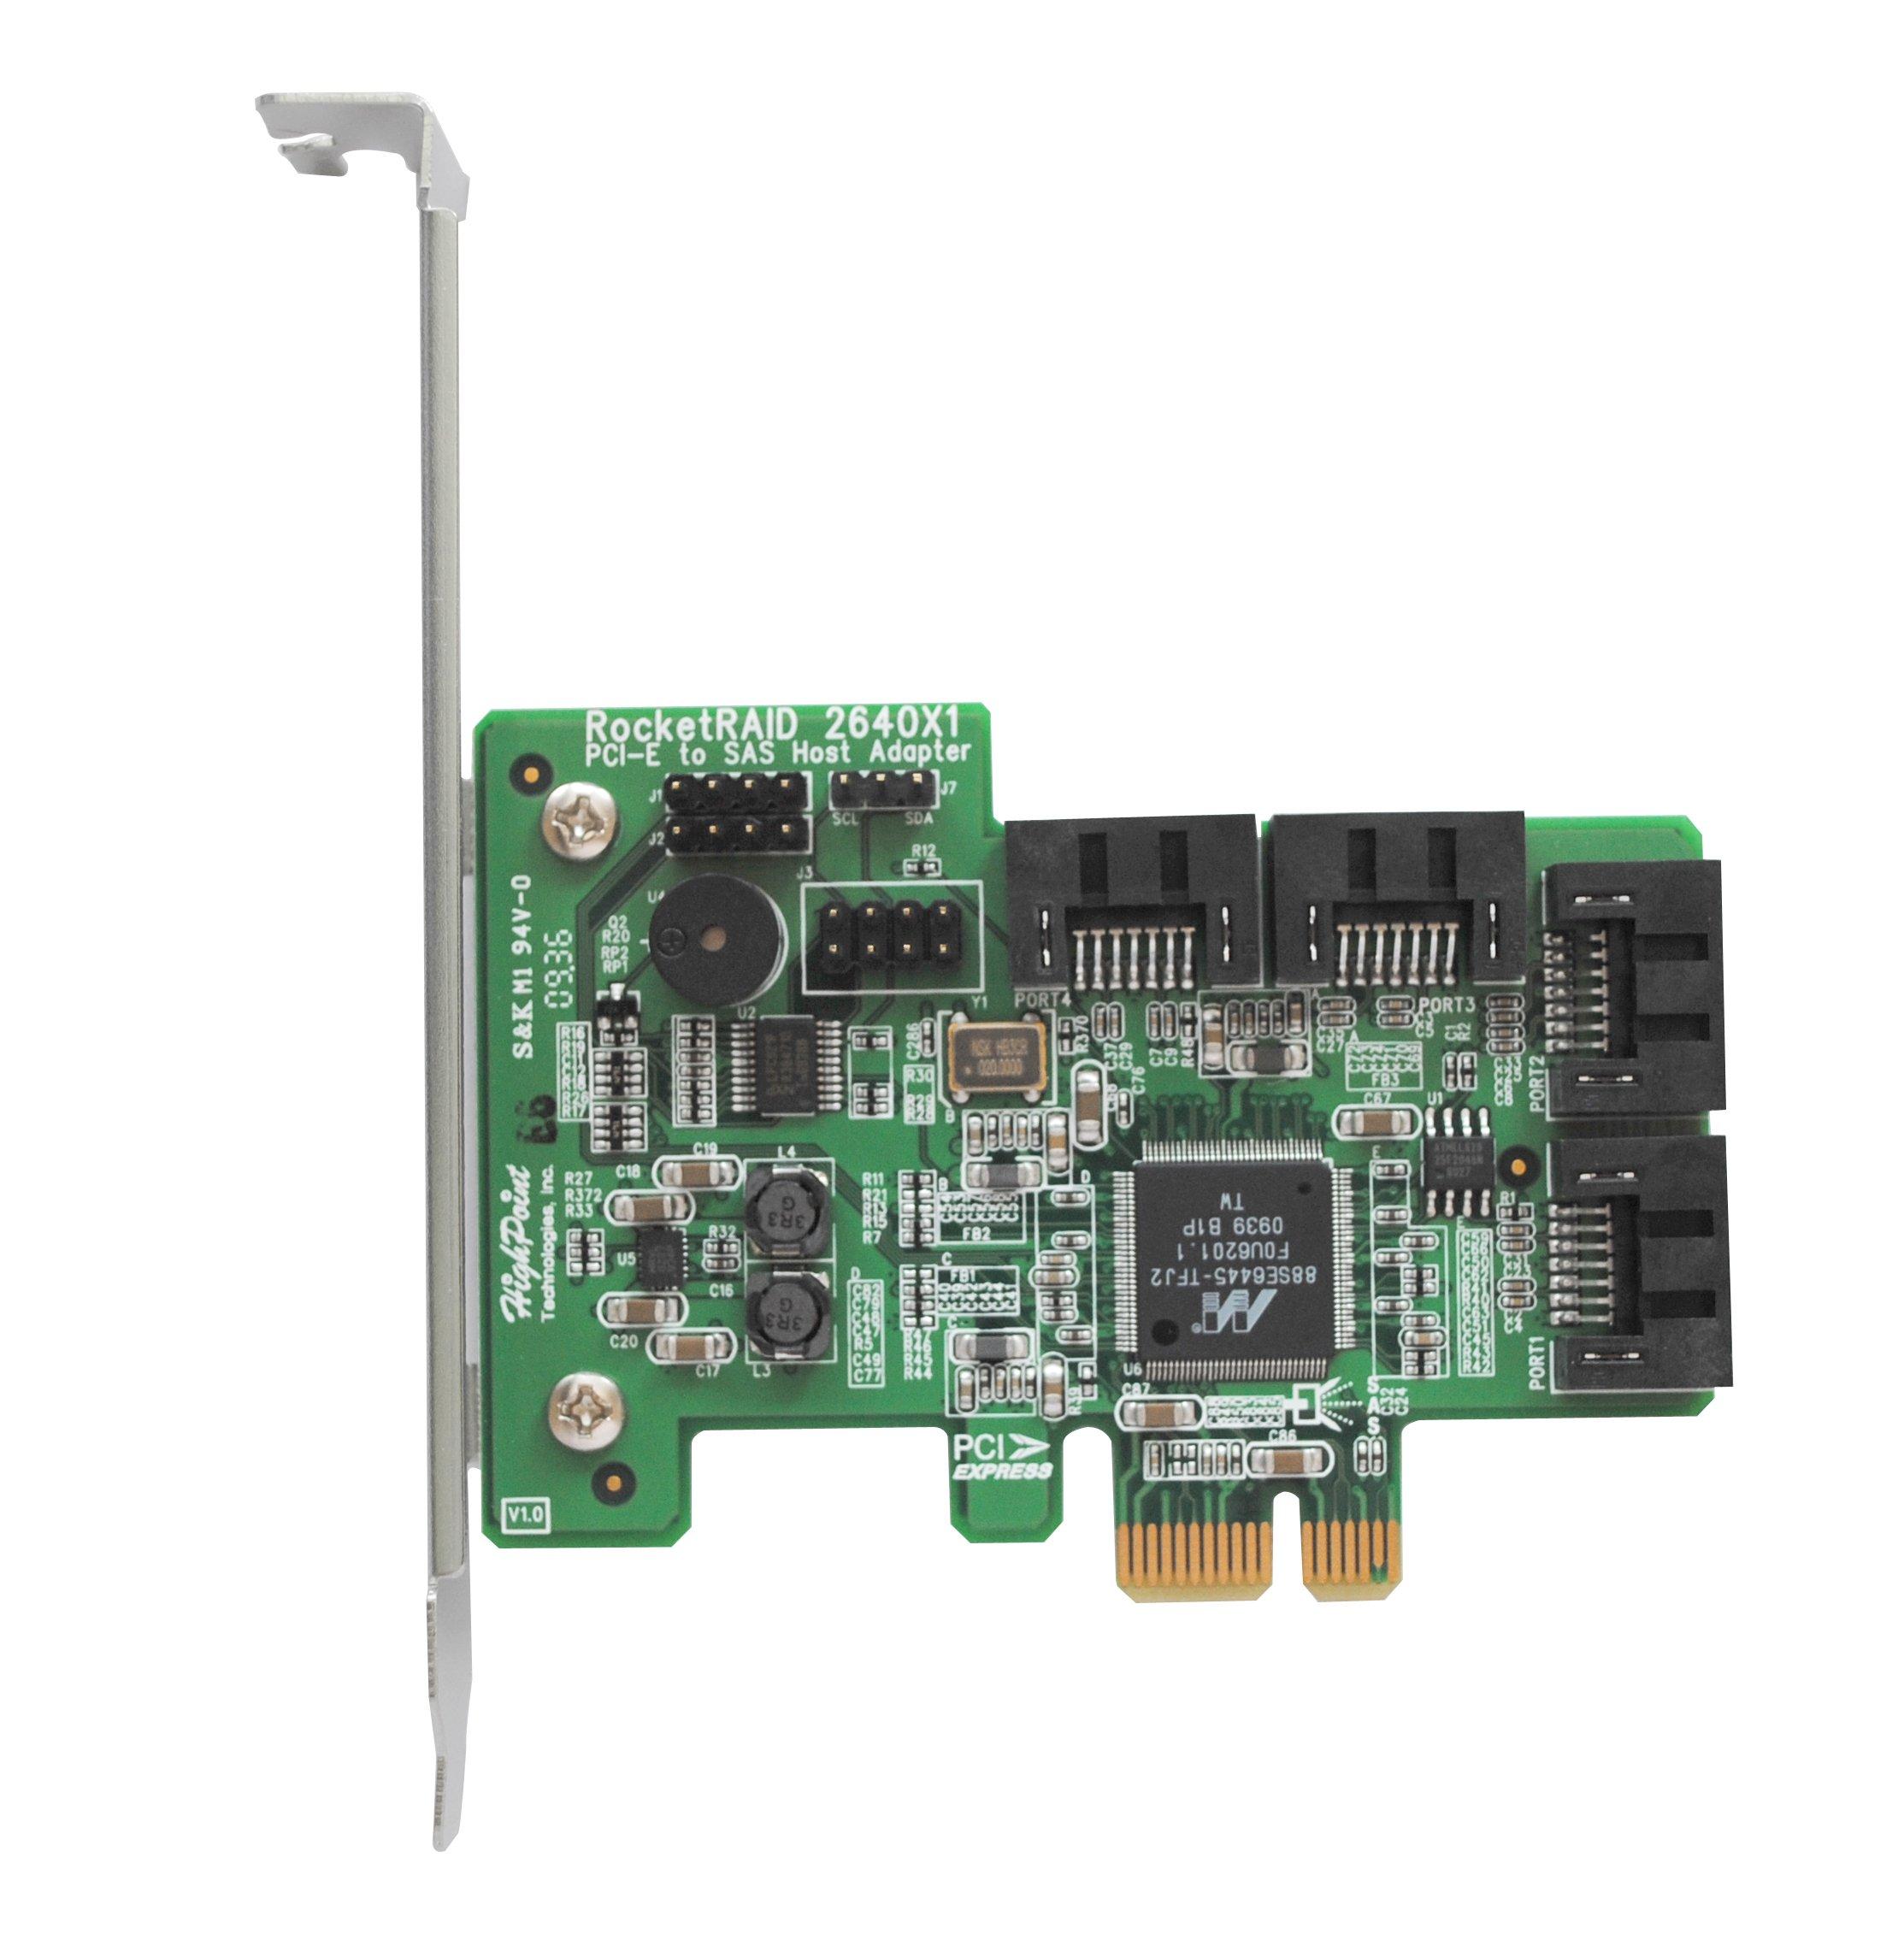 HighPoint RocketRAID 2640X1 4-Channel PCI-Express x1 SAS 3Gb/s RAID Controller by High Point (Image #4)